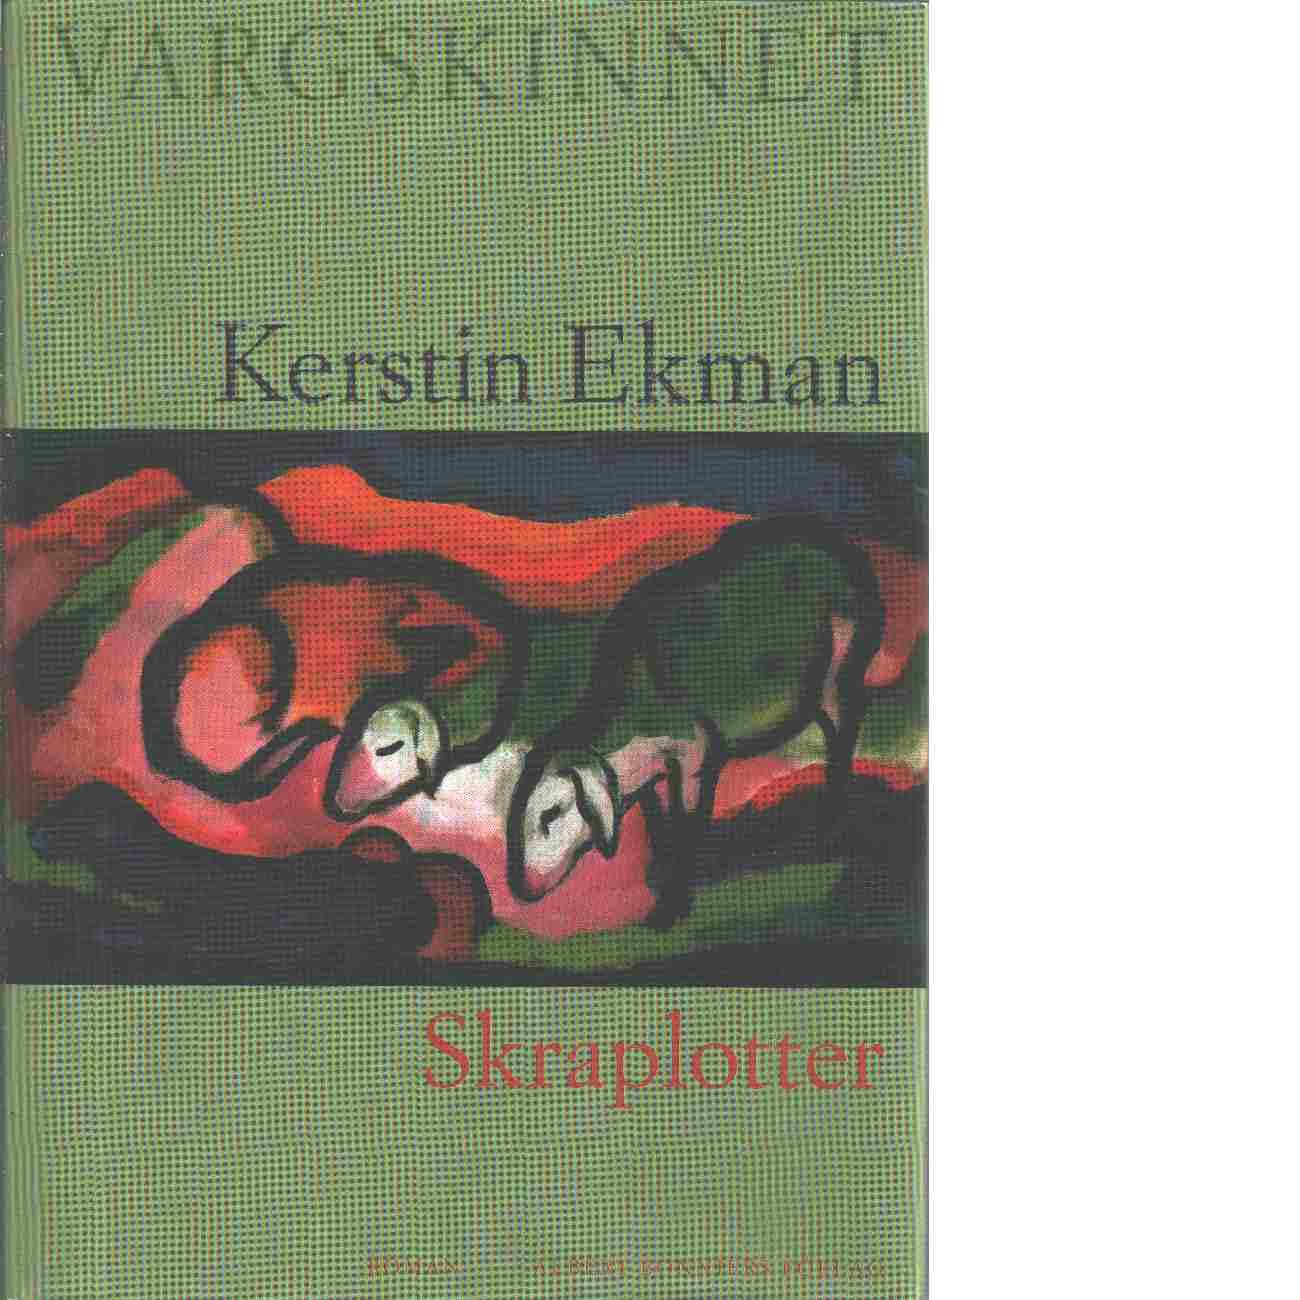 Skraplotter - Ekman, Kerstin